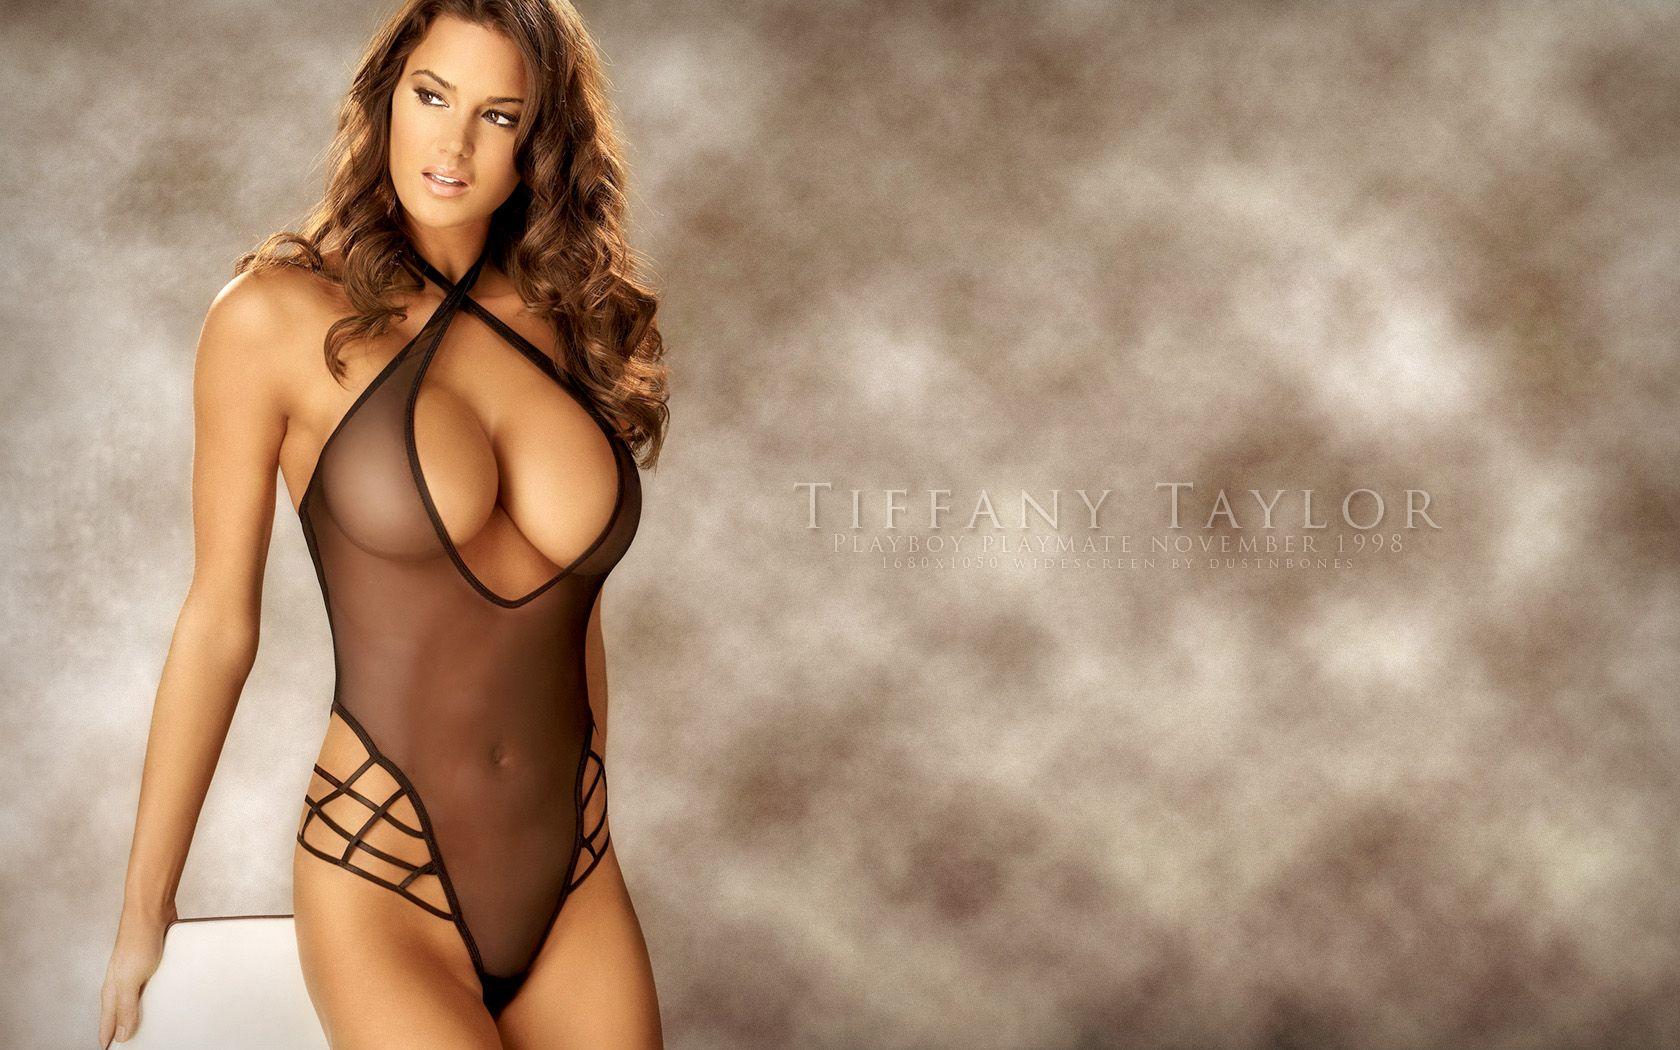 Tiffany nude in playboy magazine